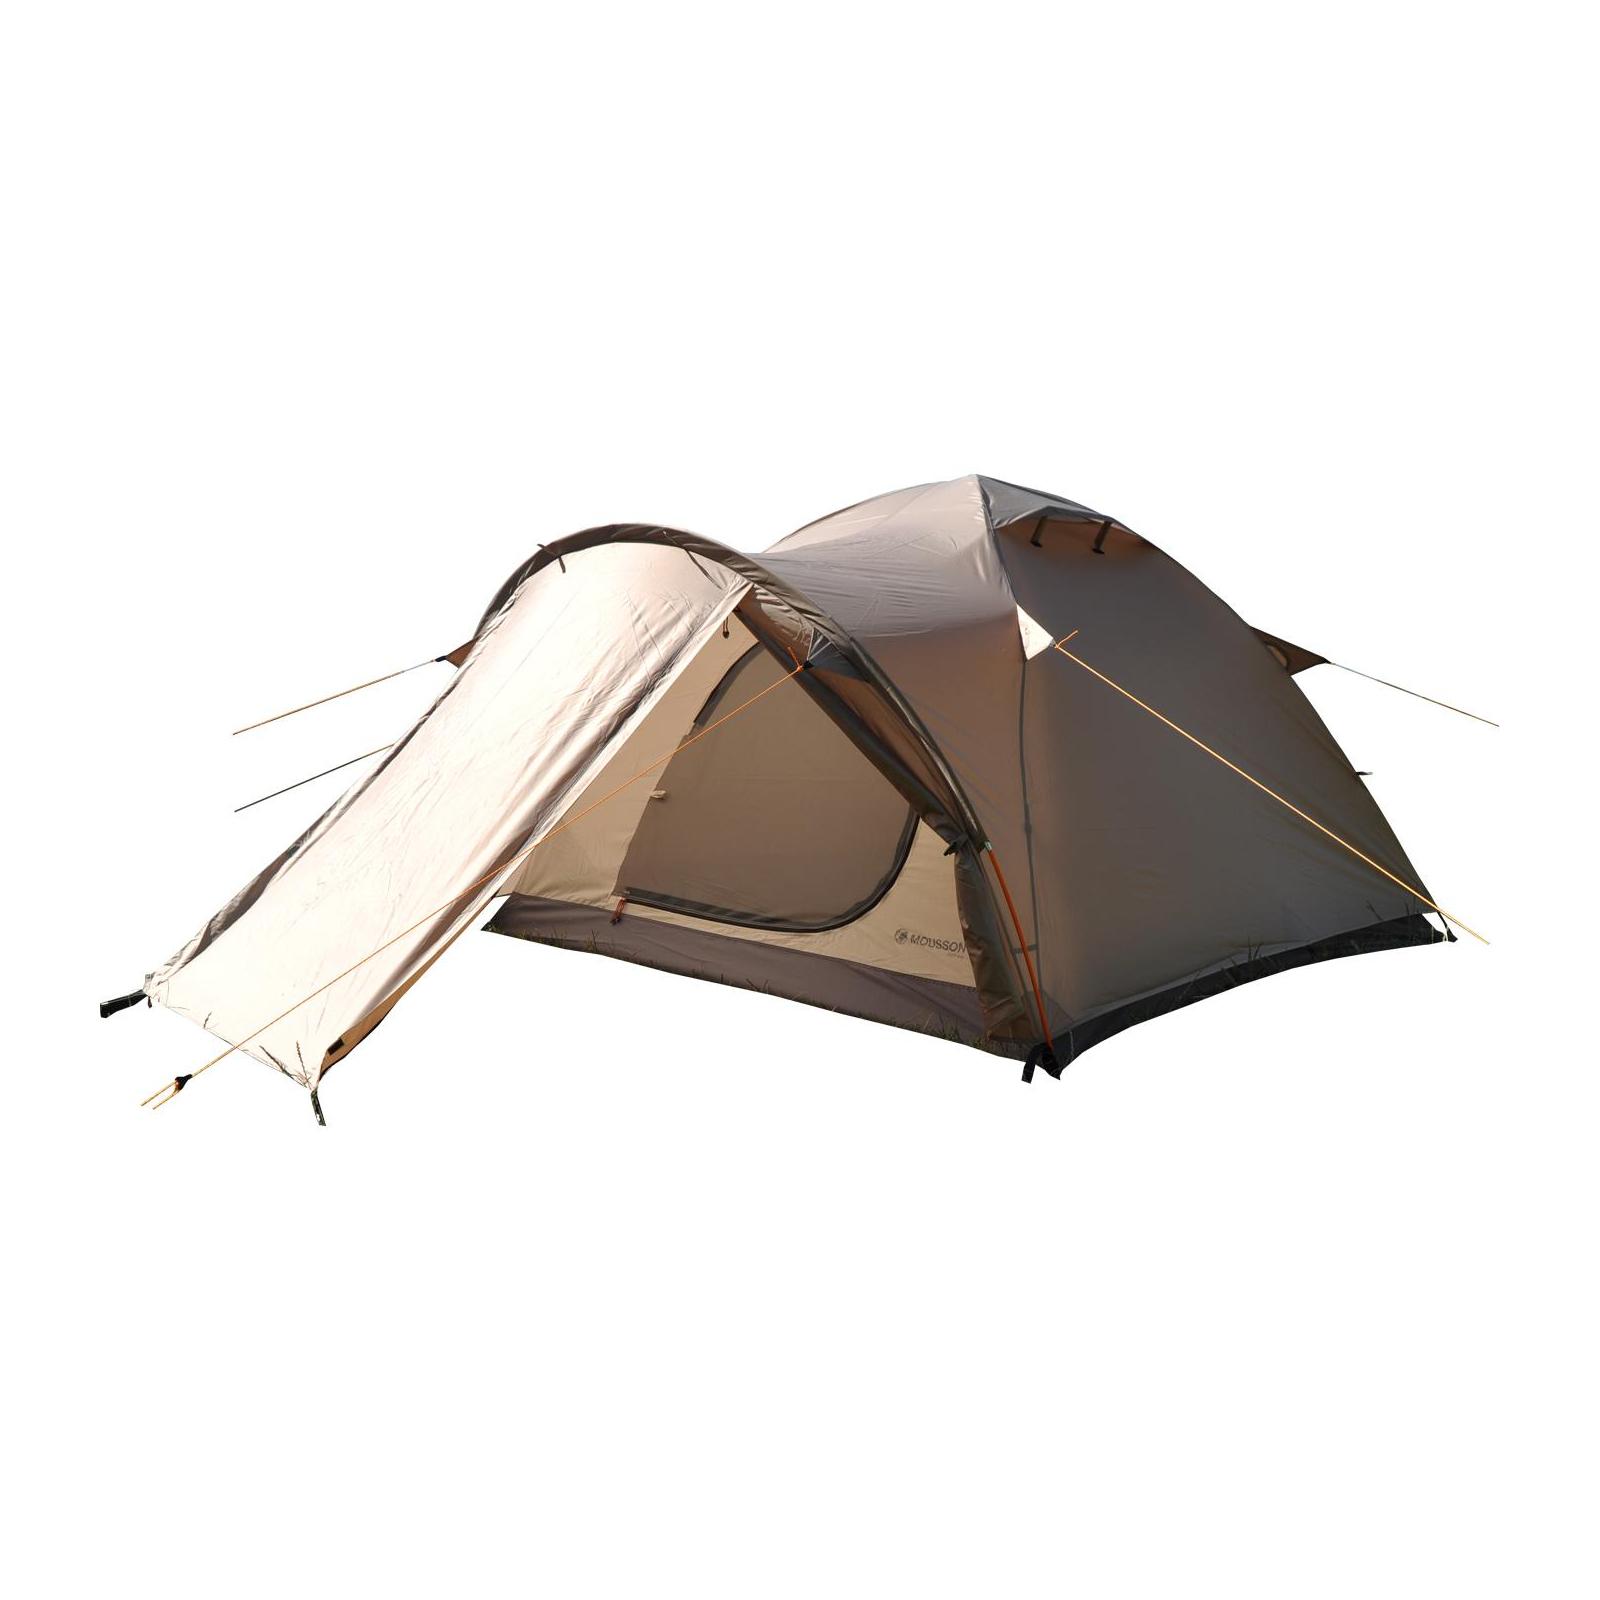 Палатка Mousson ATLANT 4 AL SAND (7883) изображение 2